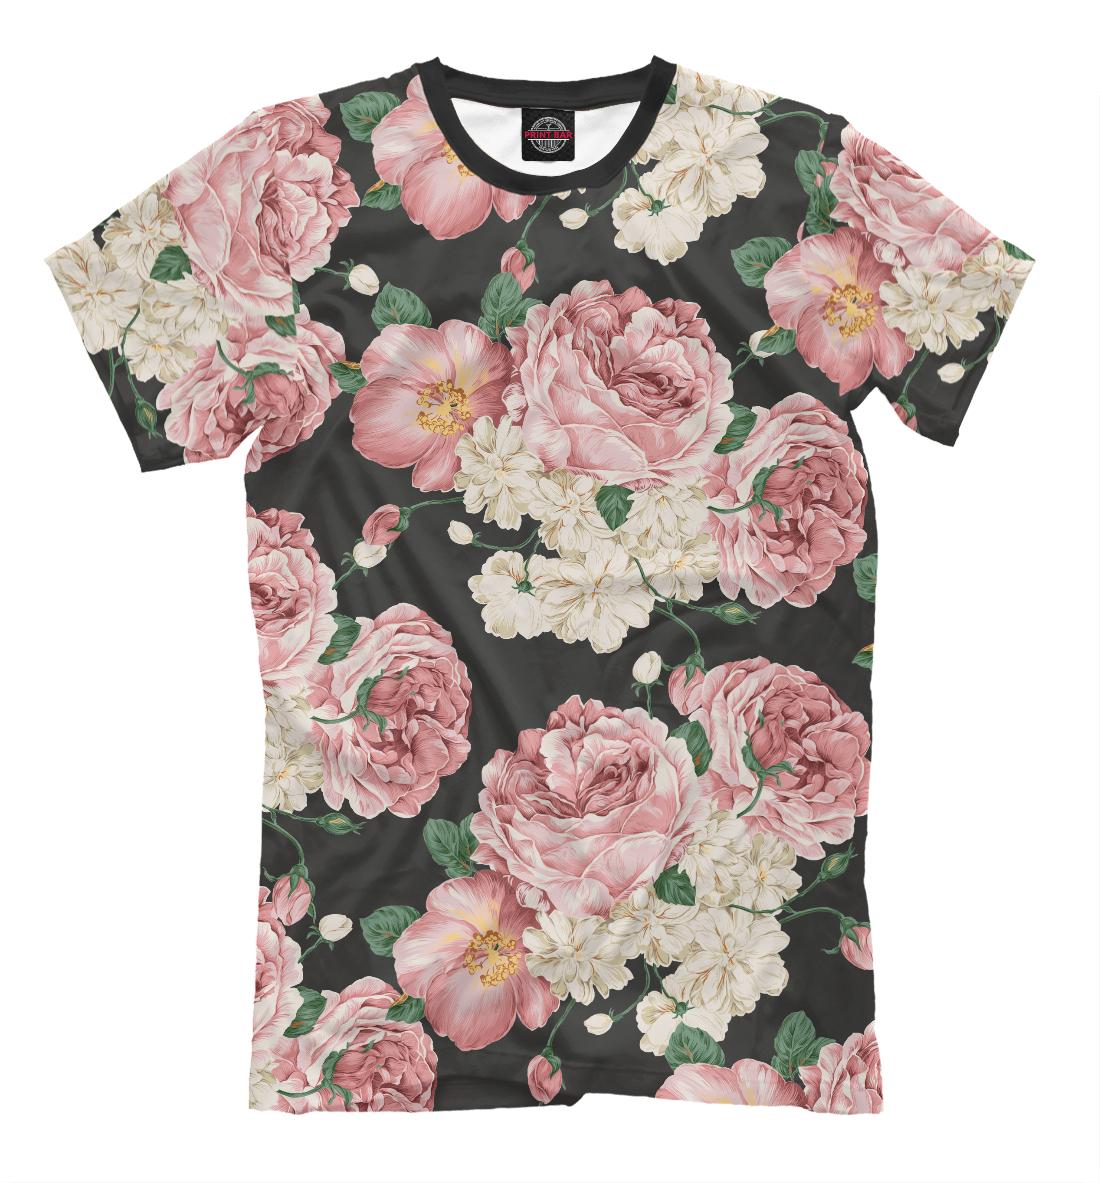 «Пионы на черном» — футболка мужская, артикул: CVE-640894-fut-2